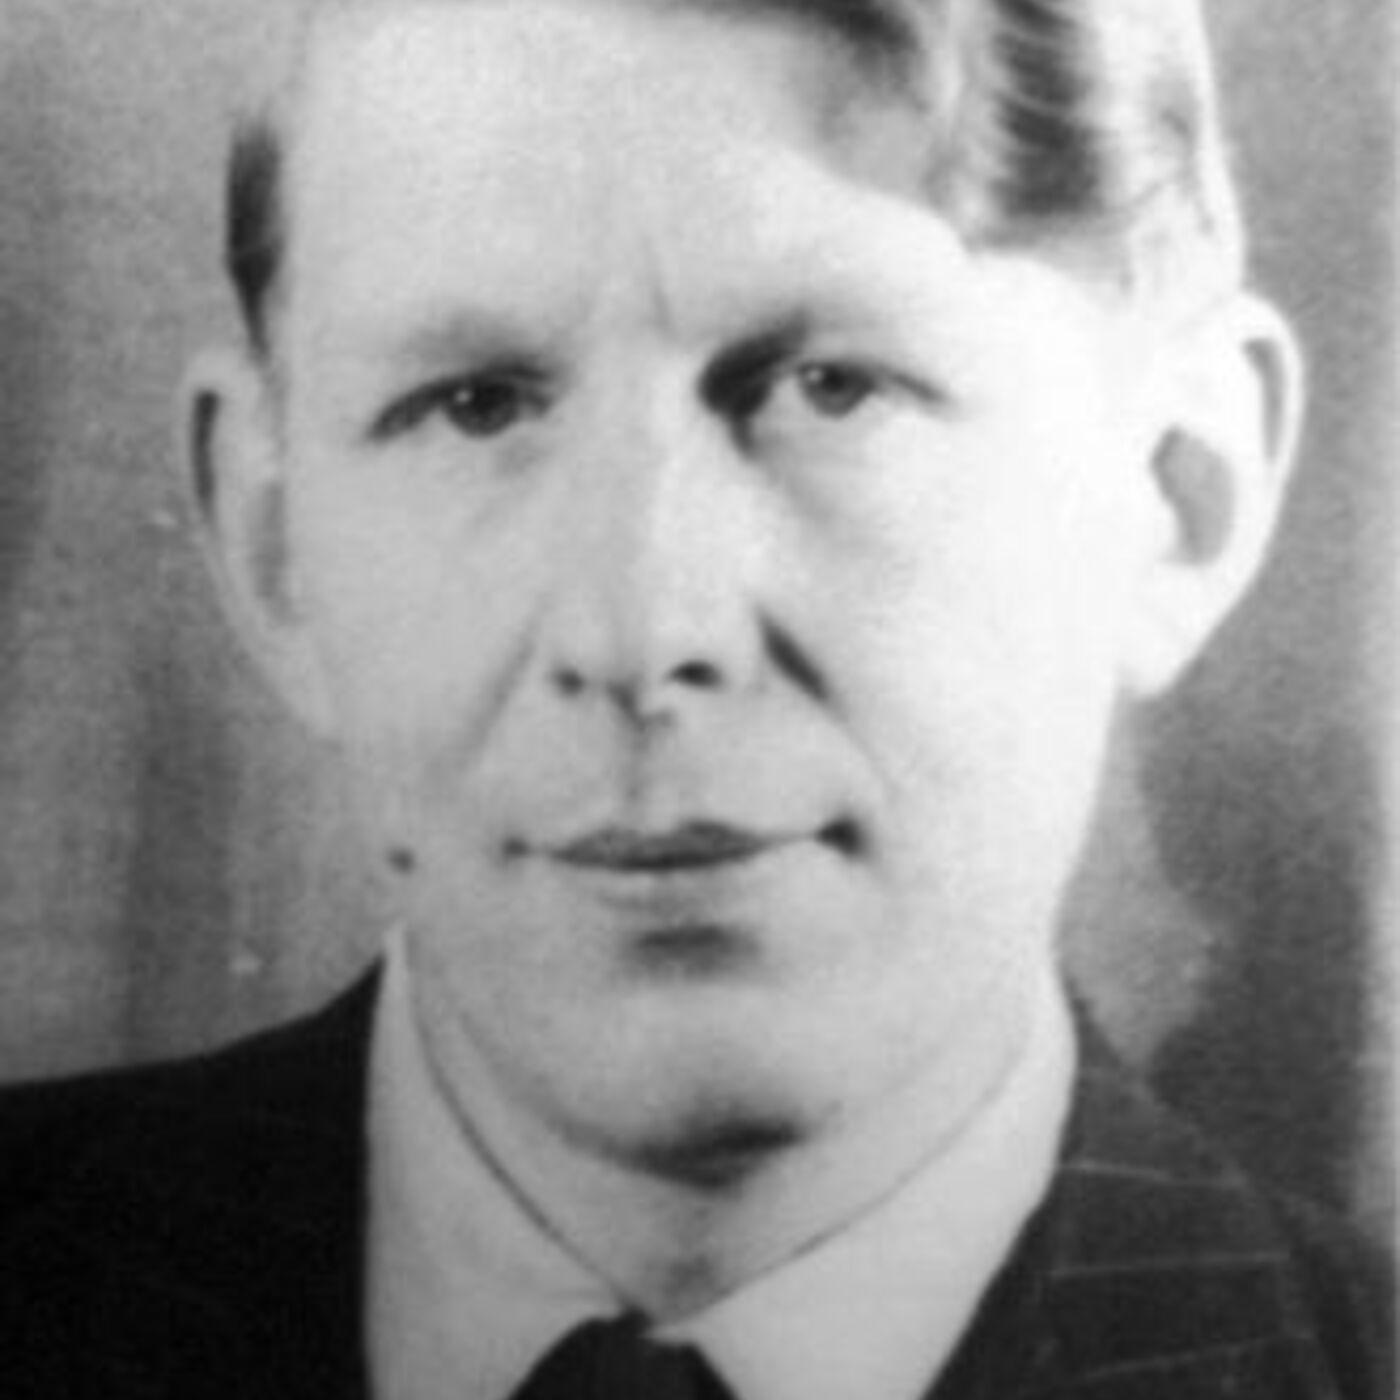 W H Auden The Novelist The Fall of Rome September 1st 1939